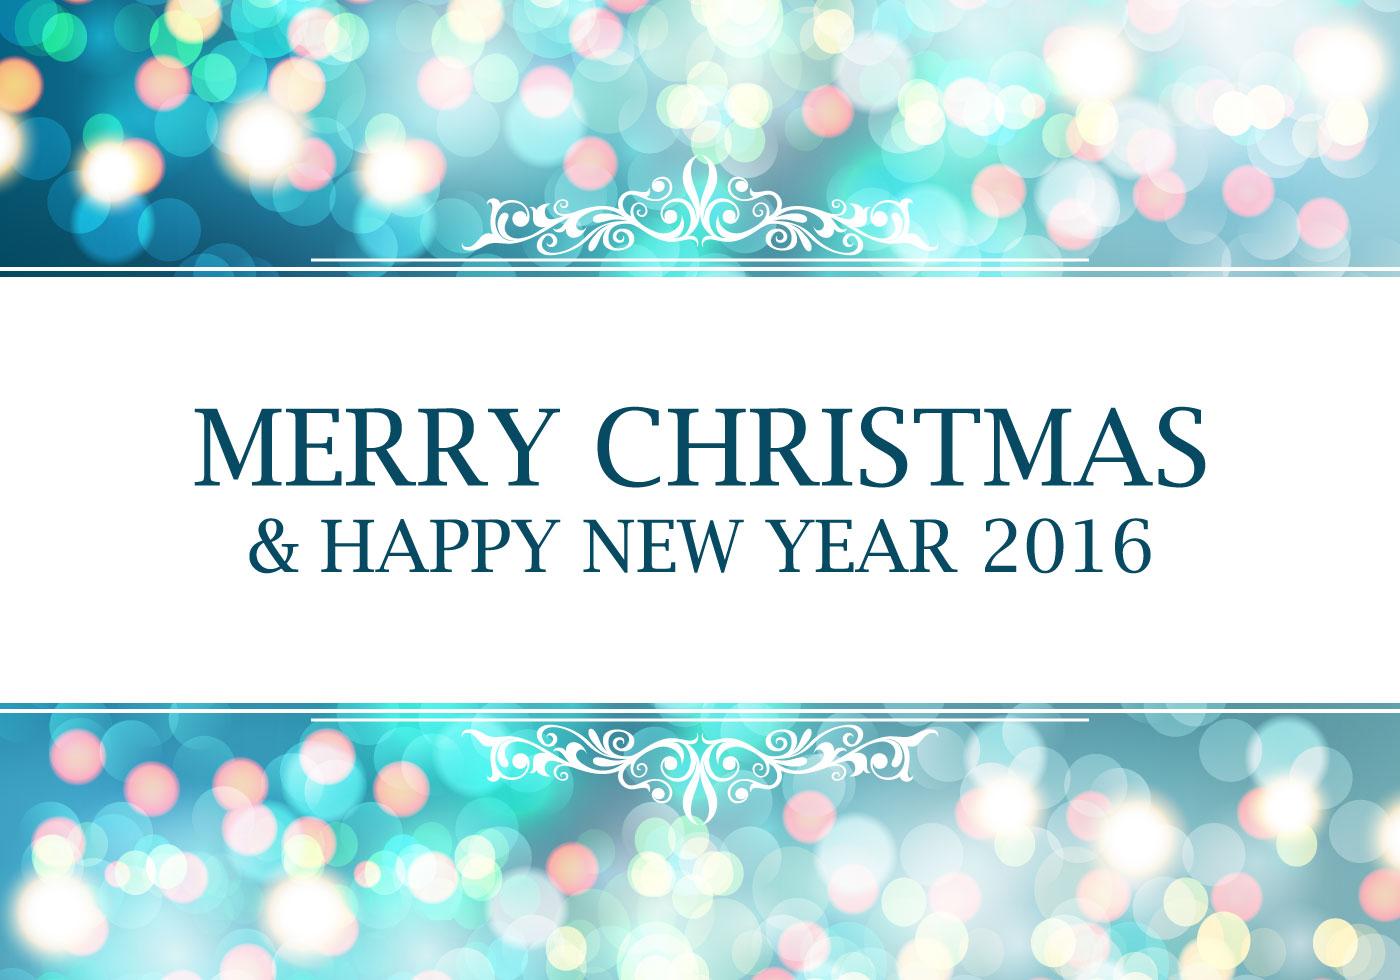 Merry Christmas Wall Art, Canvas Prints, Framed Prints ...  Merry Christmas Fractal Art